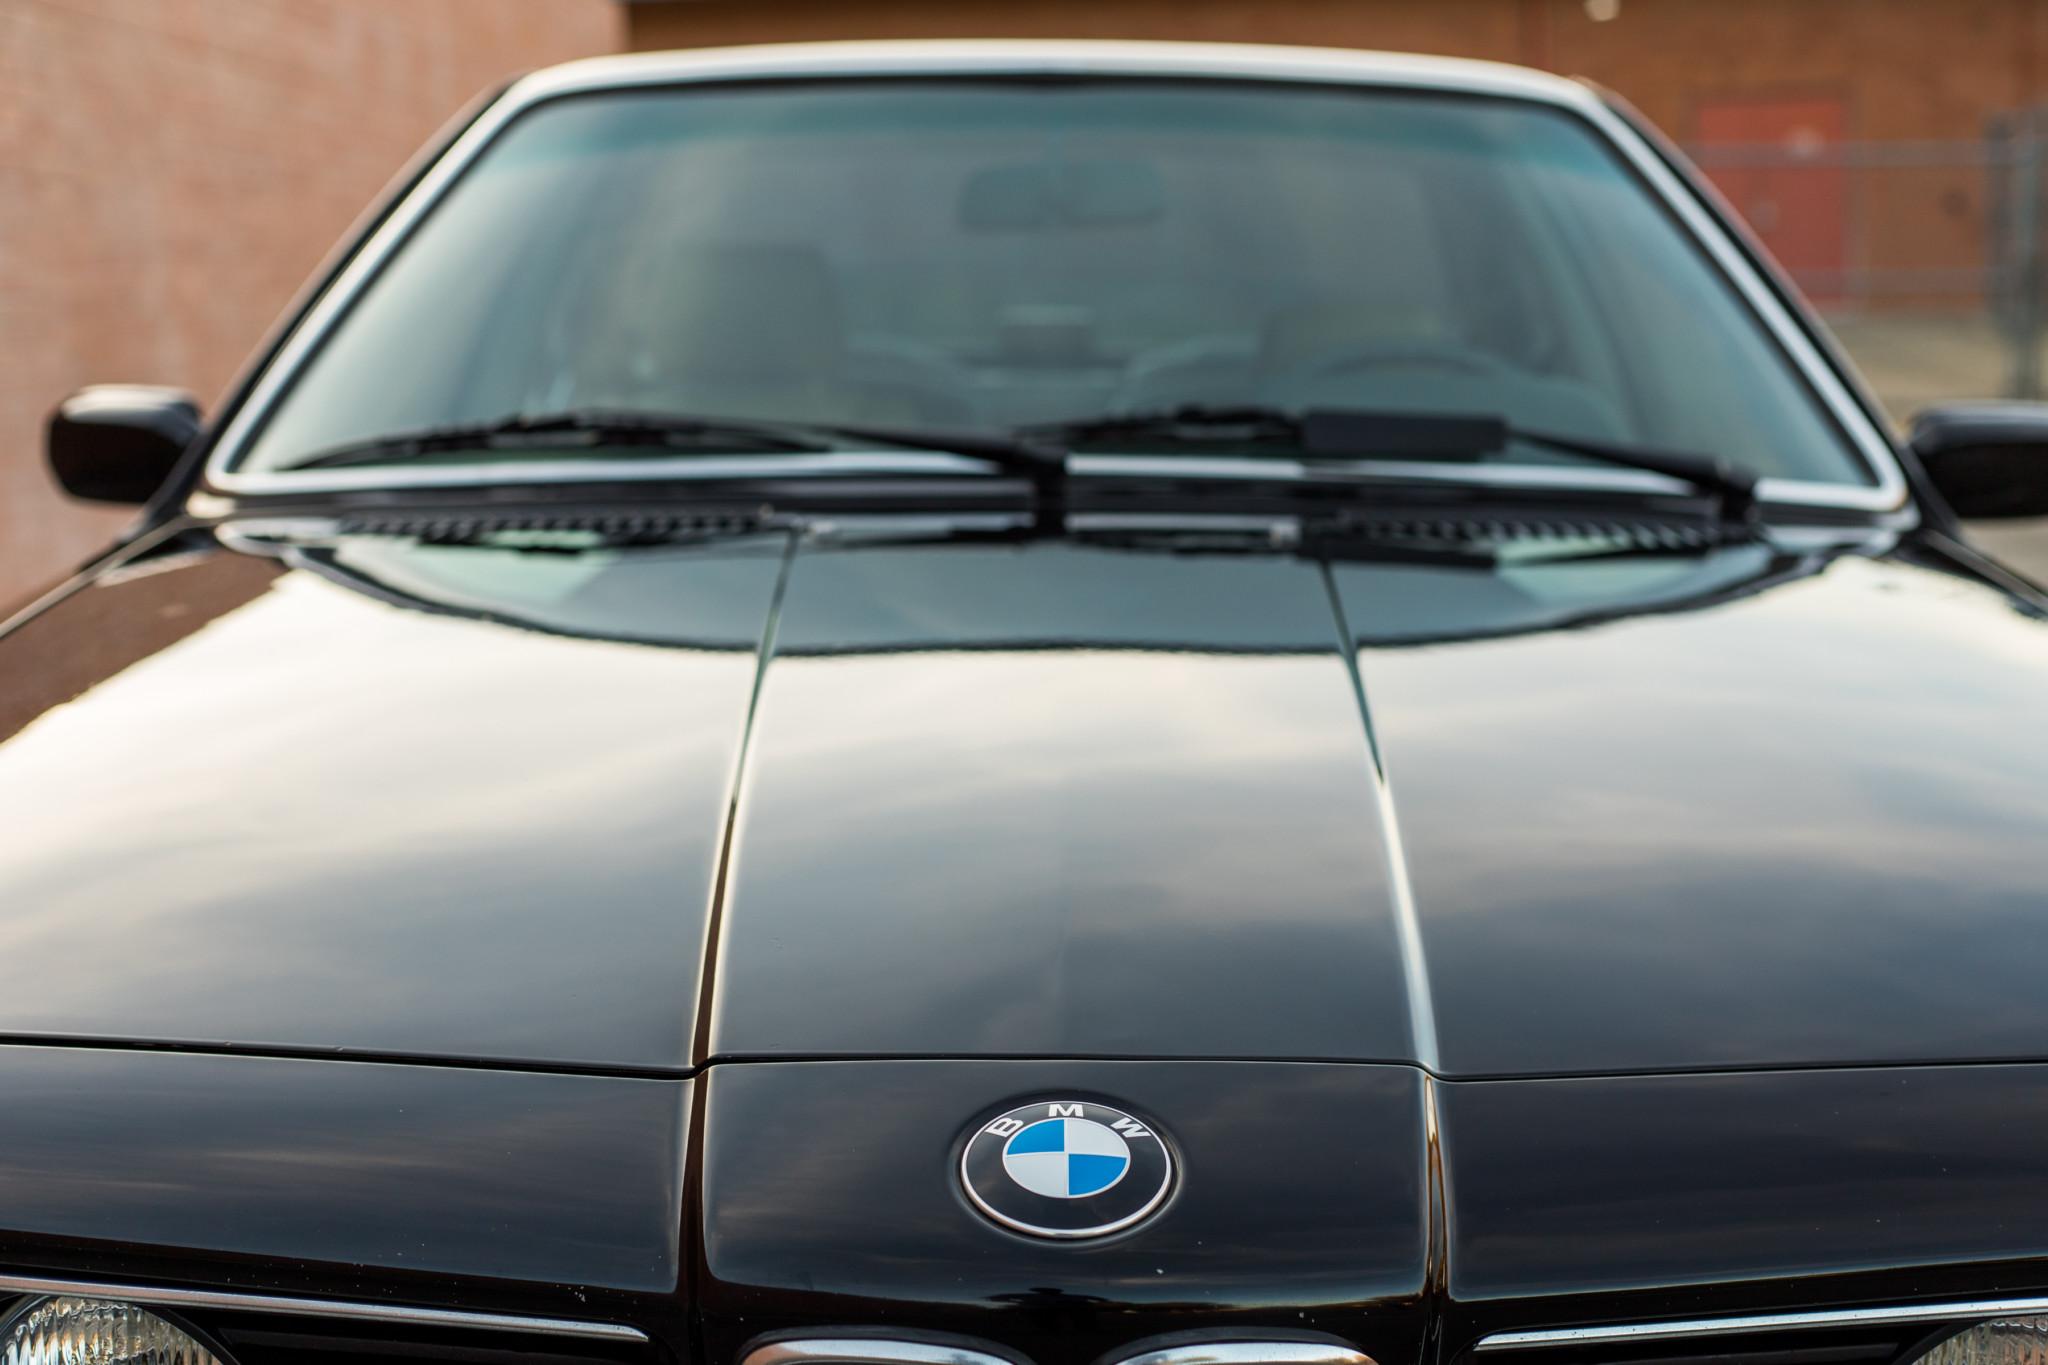 1988 bmw M6 kent classic cars (22).jpg